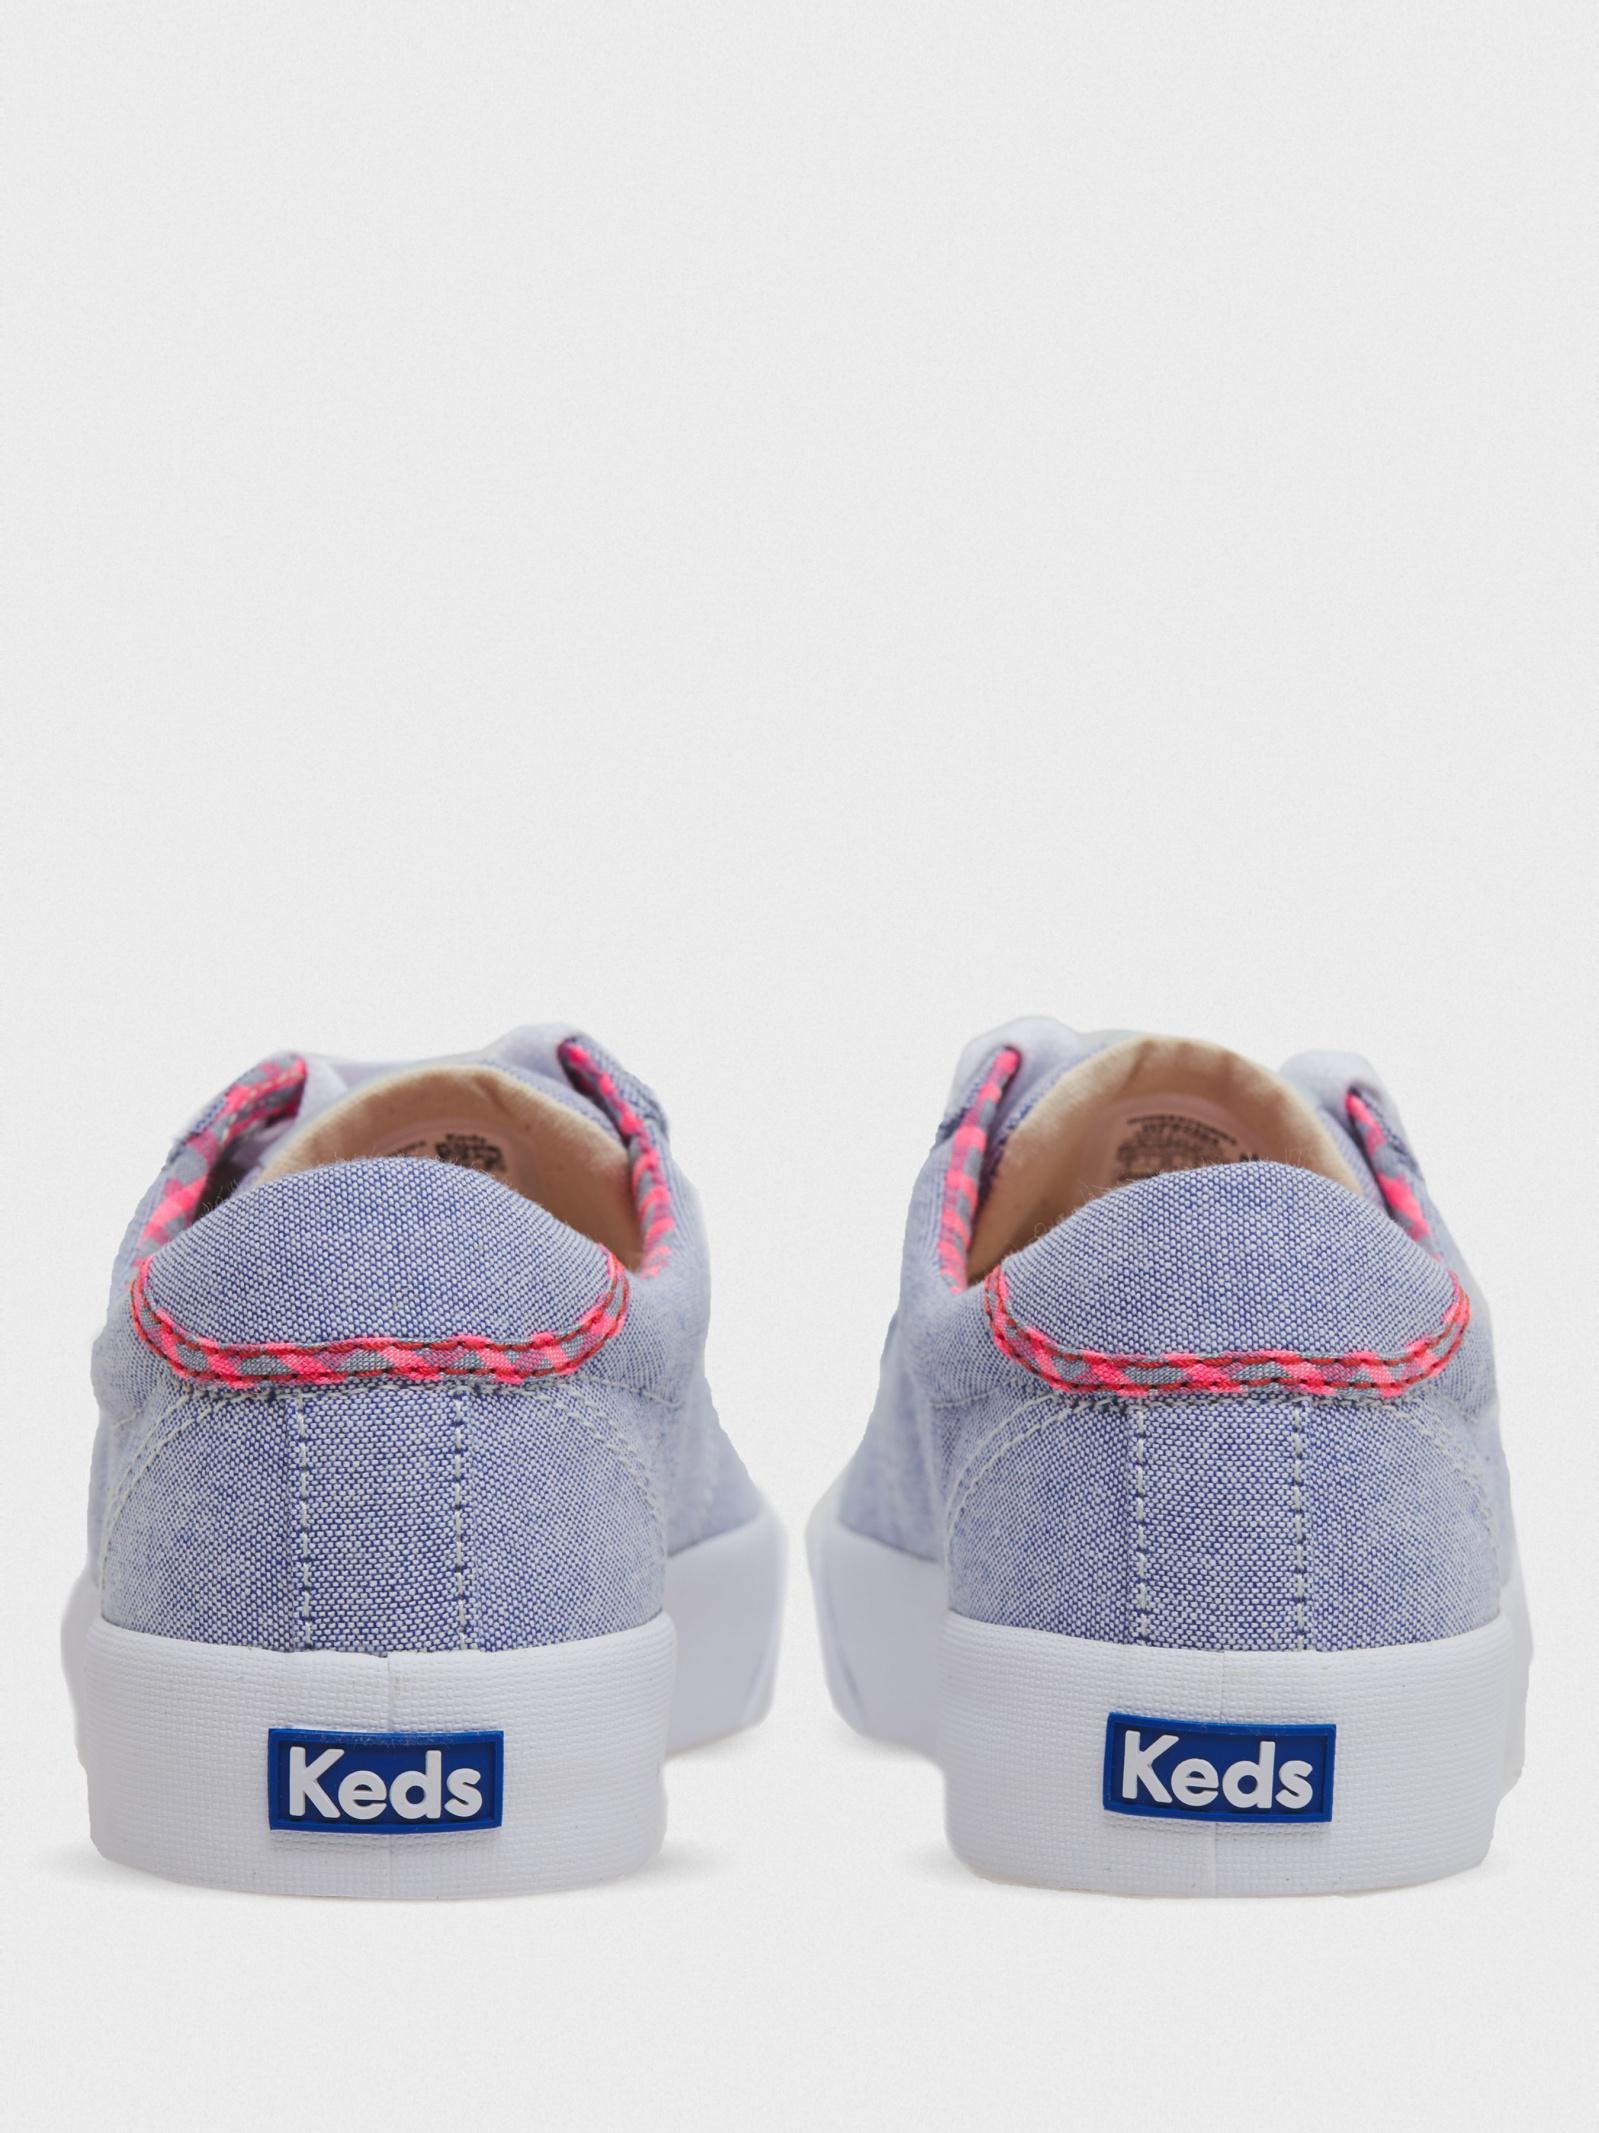 Кеды для женщин KEDS CREW KICK 75 CHAMBRAY KD328 фото, купить, 2017